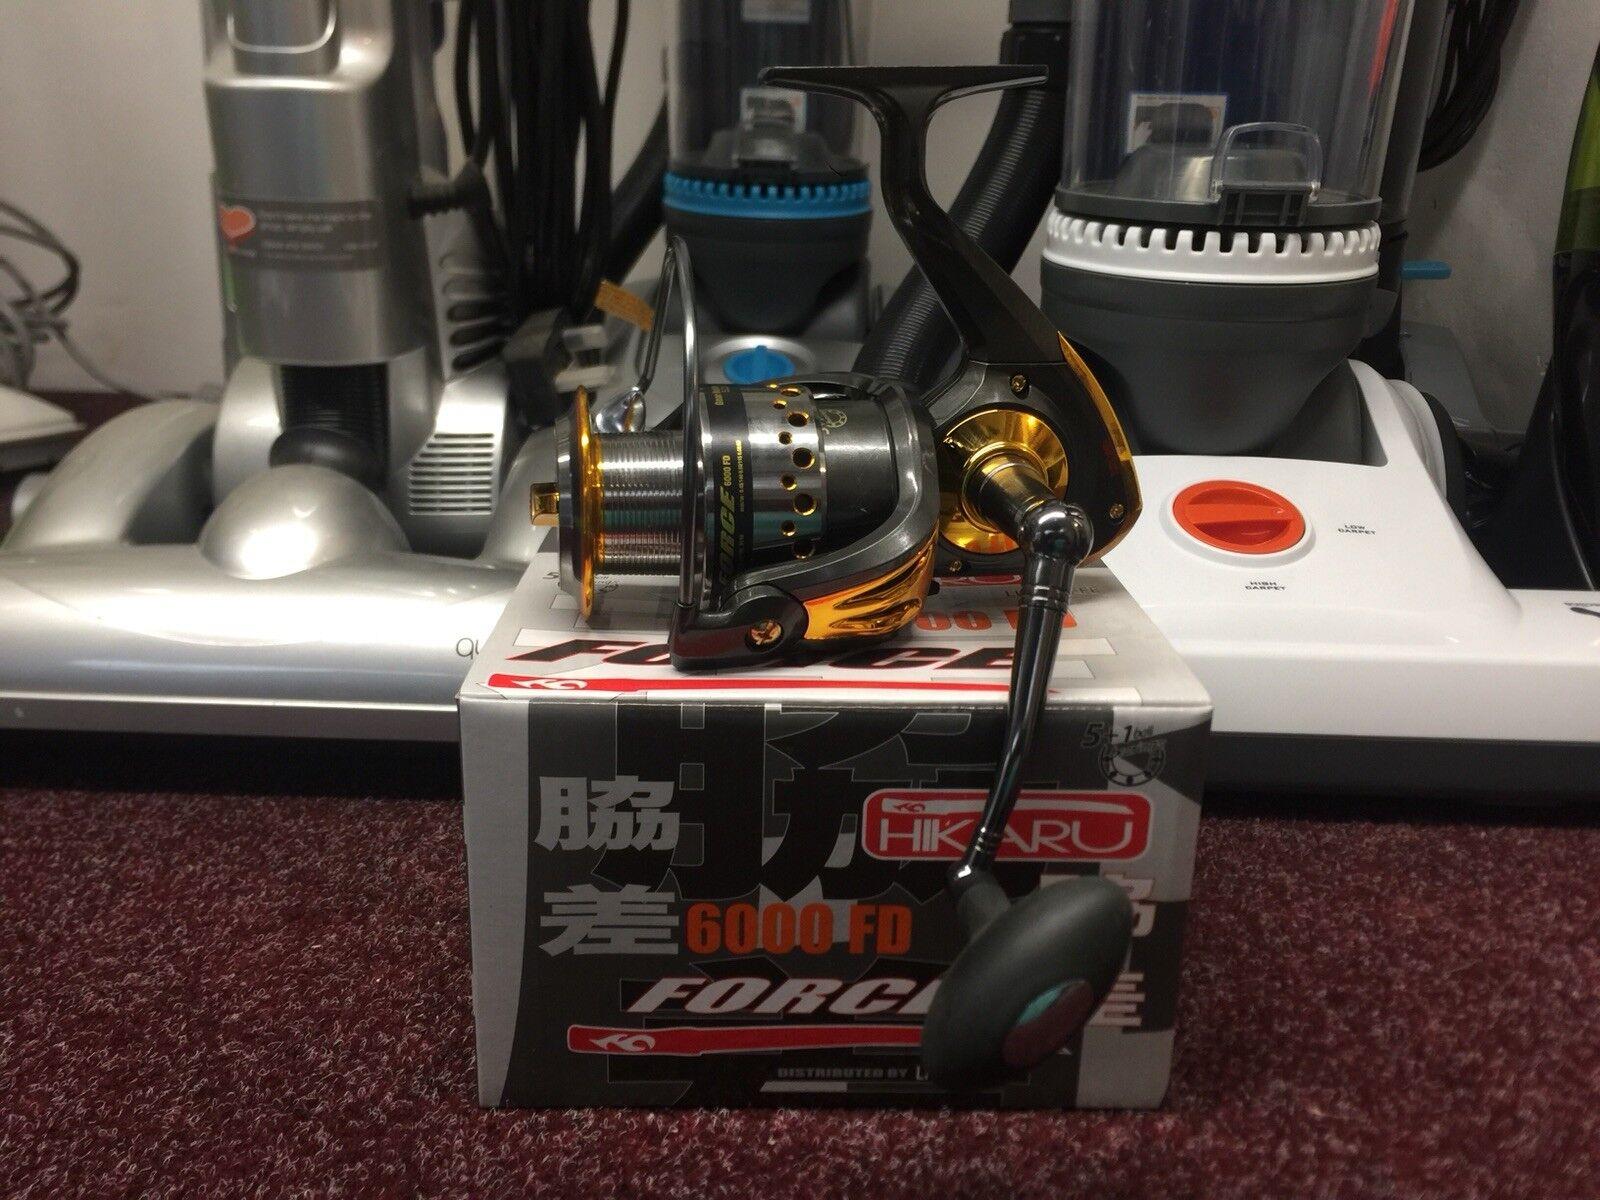 Lineaeffe Hikaru Force 6000 FD Fixed Spool Reel